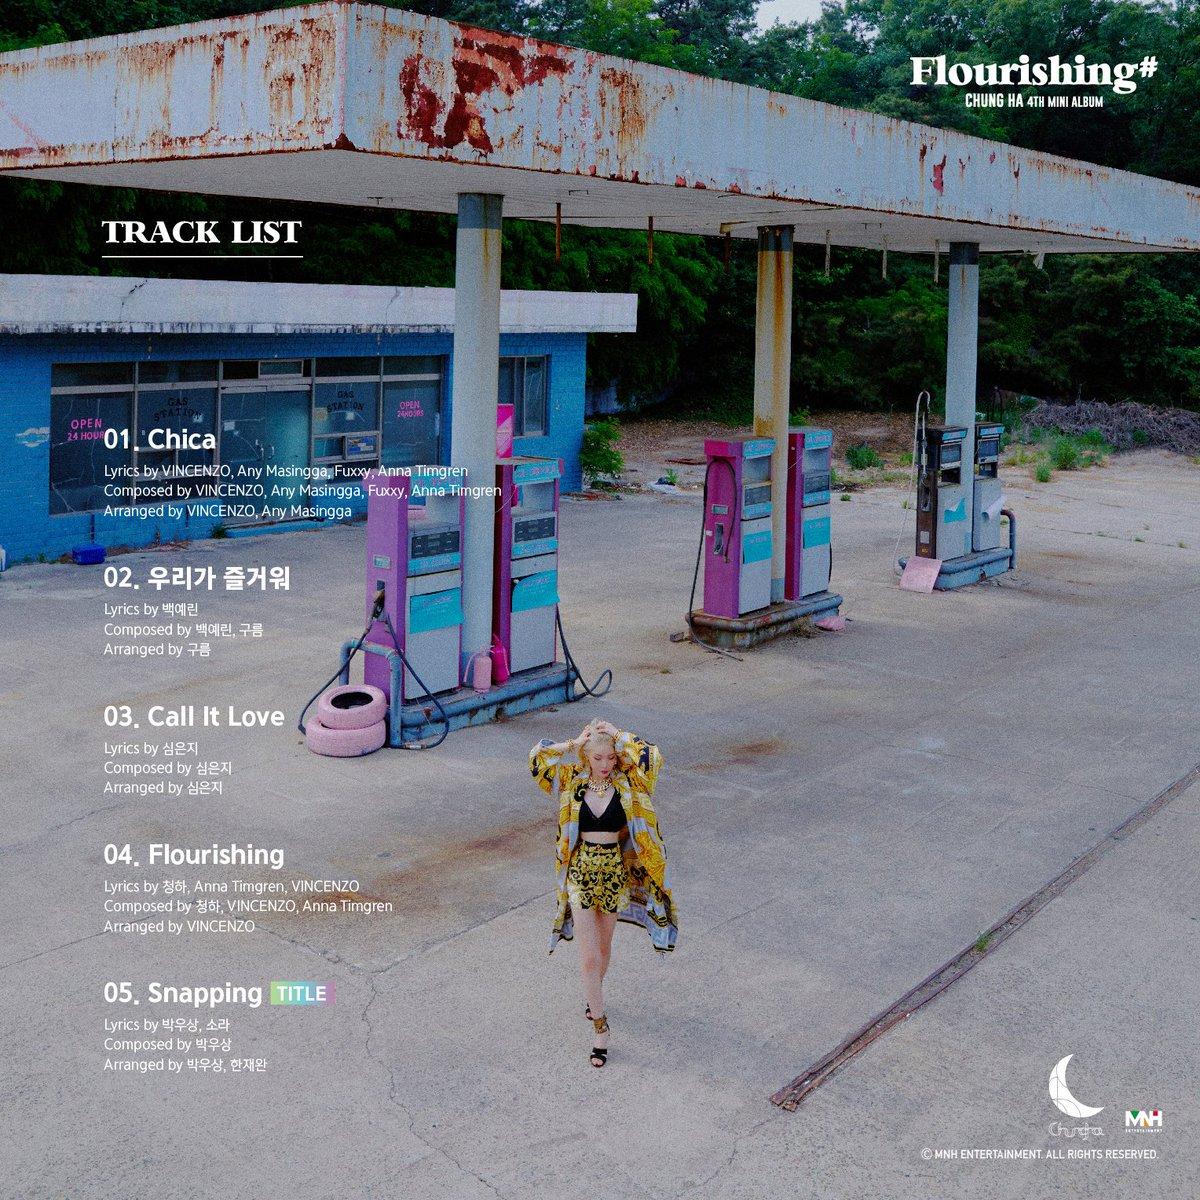 CHUNG HA 4th Mini Album 'Flourishing' Track List  ✔ 2019. 06. 24. 6PM (KST)  #청하 #CHUNGHA #Chica #우리가_즐거워 #Call_It_Love #Flourishing #Snapping